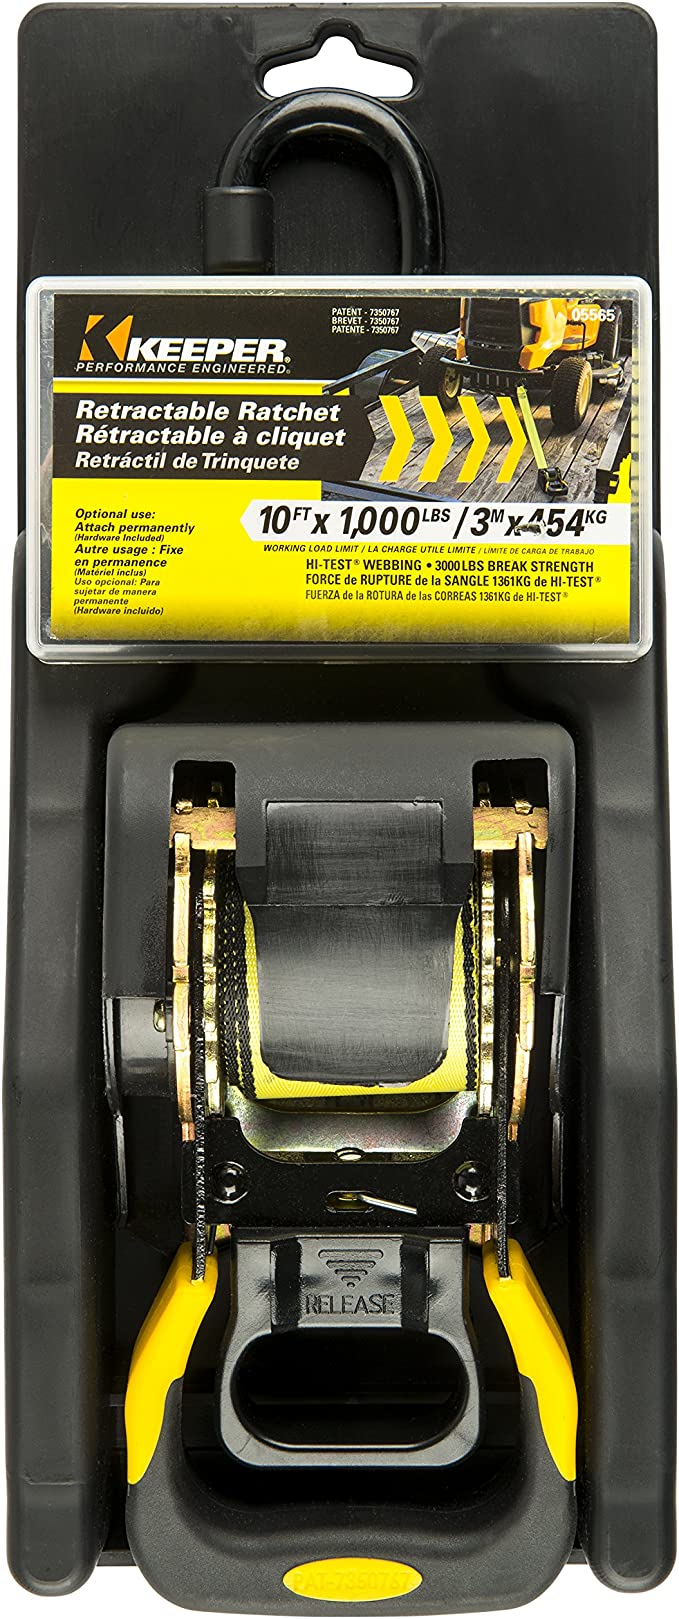 1000 lbs Working Load Limit Keeper 05565 10 x 1-7//8 ProGrade Retractable Tie Down